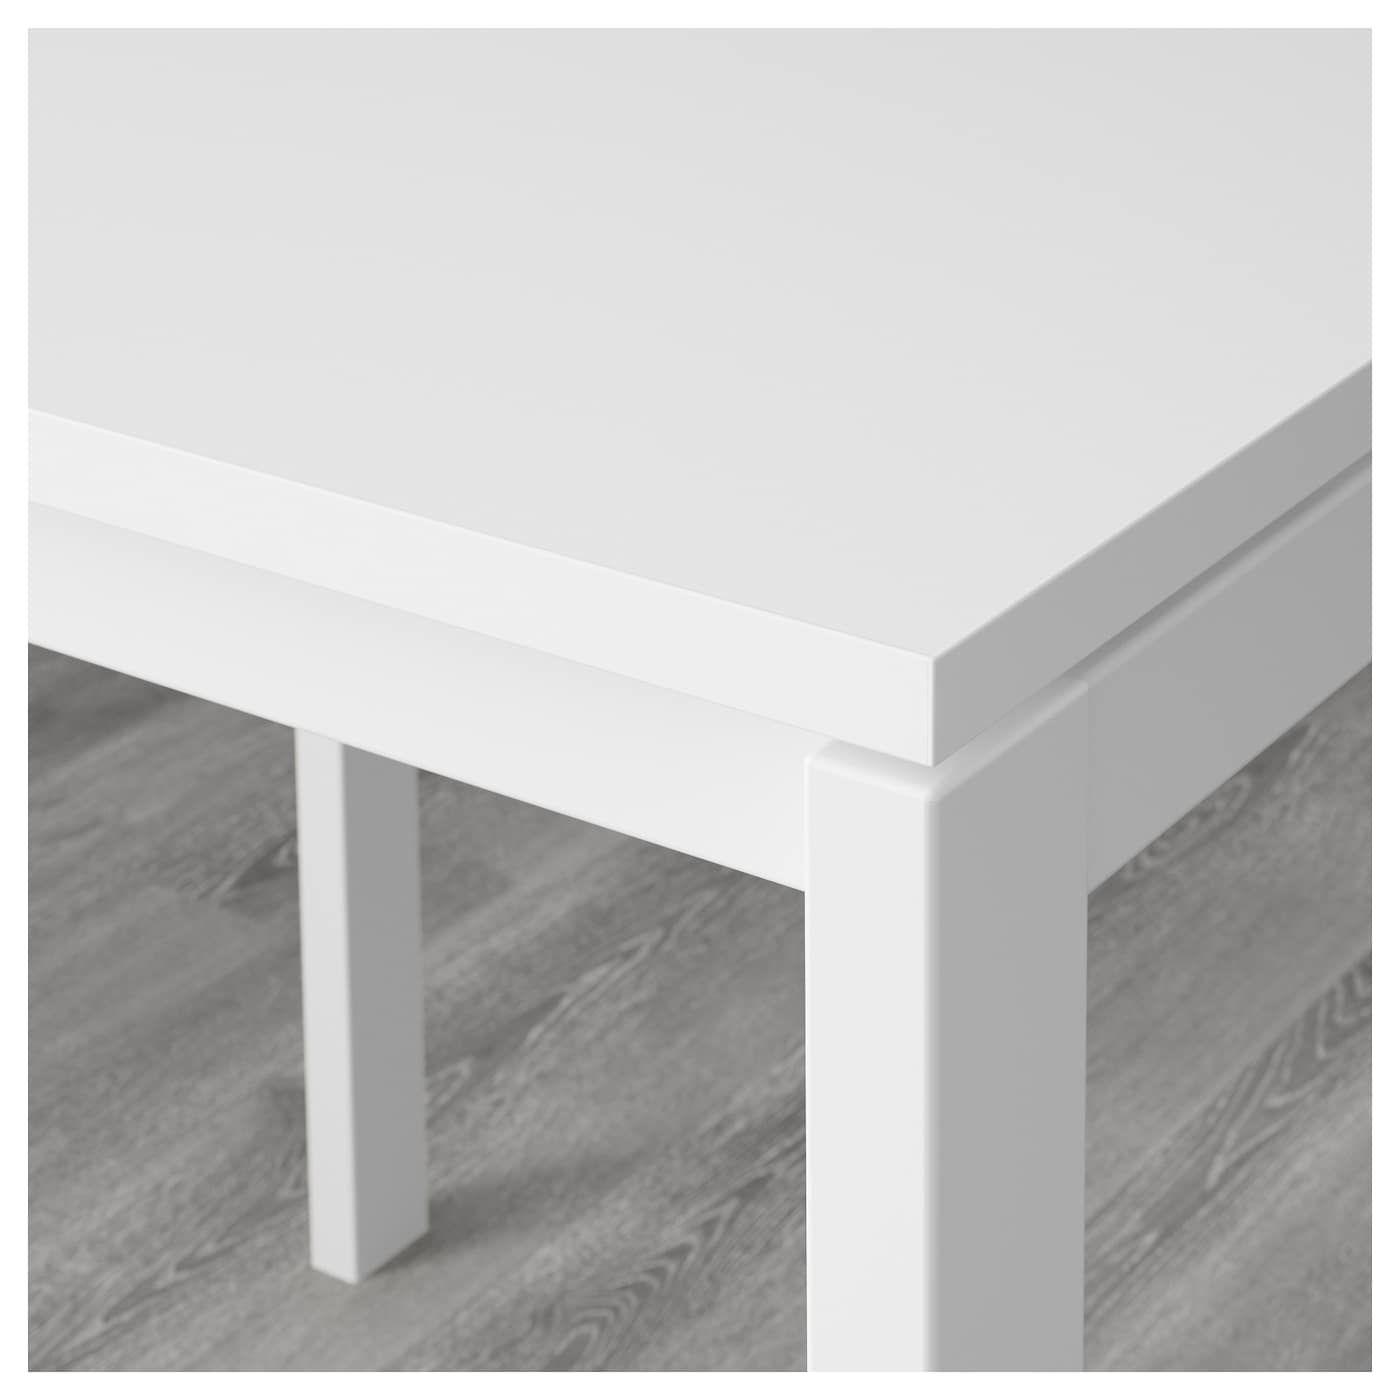 Ikea Sedie Pieghevoli Nisse.Melltorp Nisse Tavolo E 2 Sedie Pieghevoli Bianco Bianco